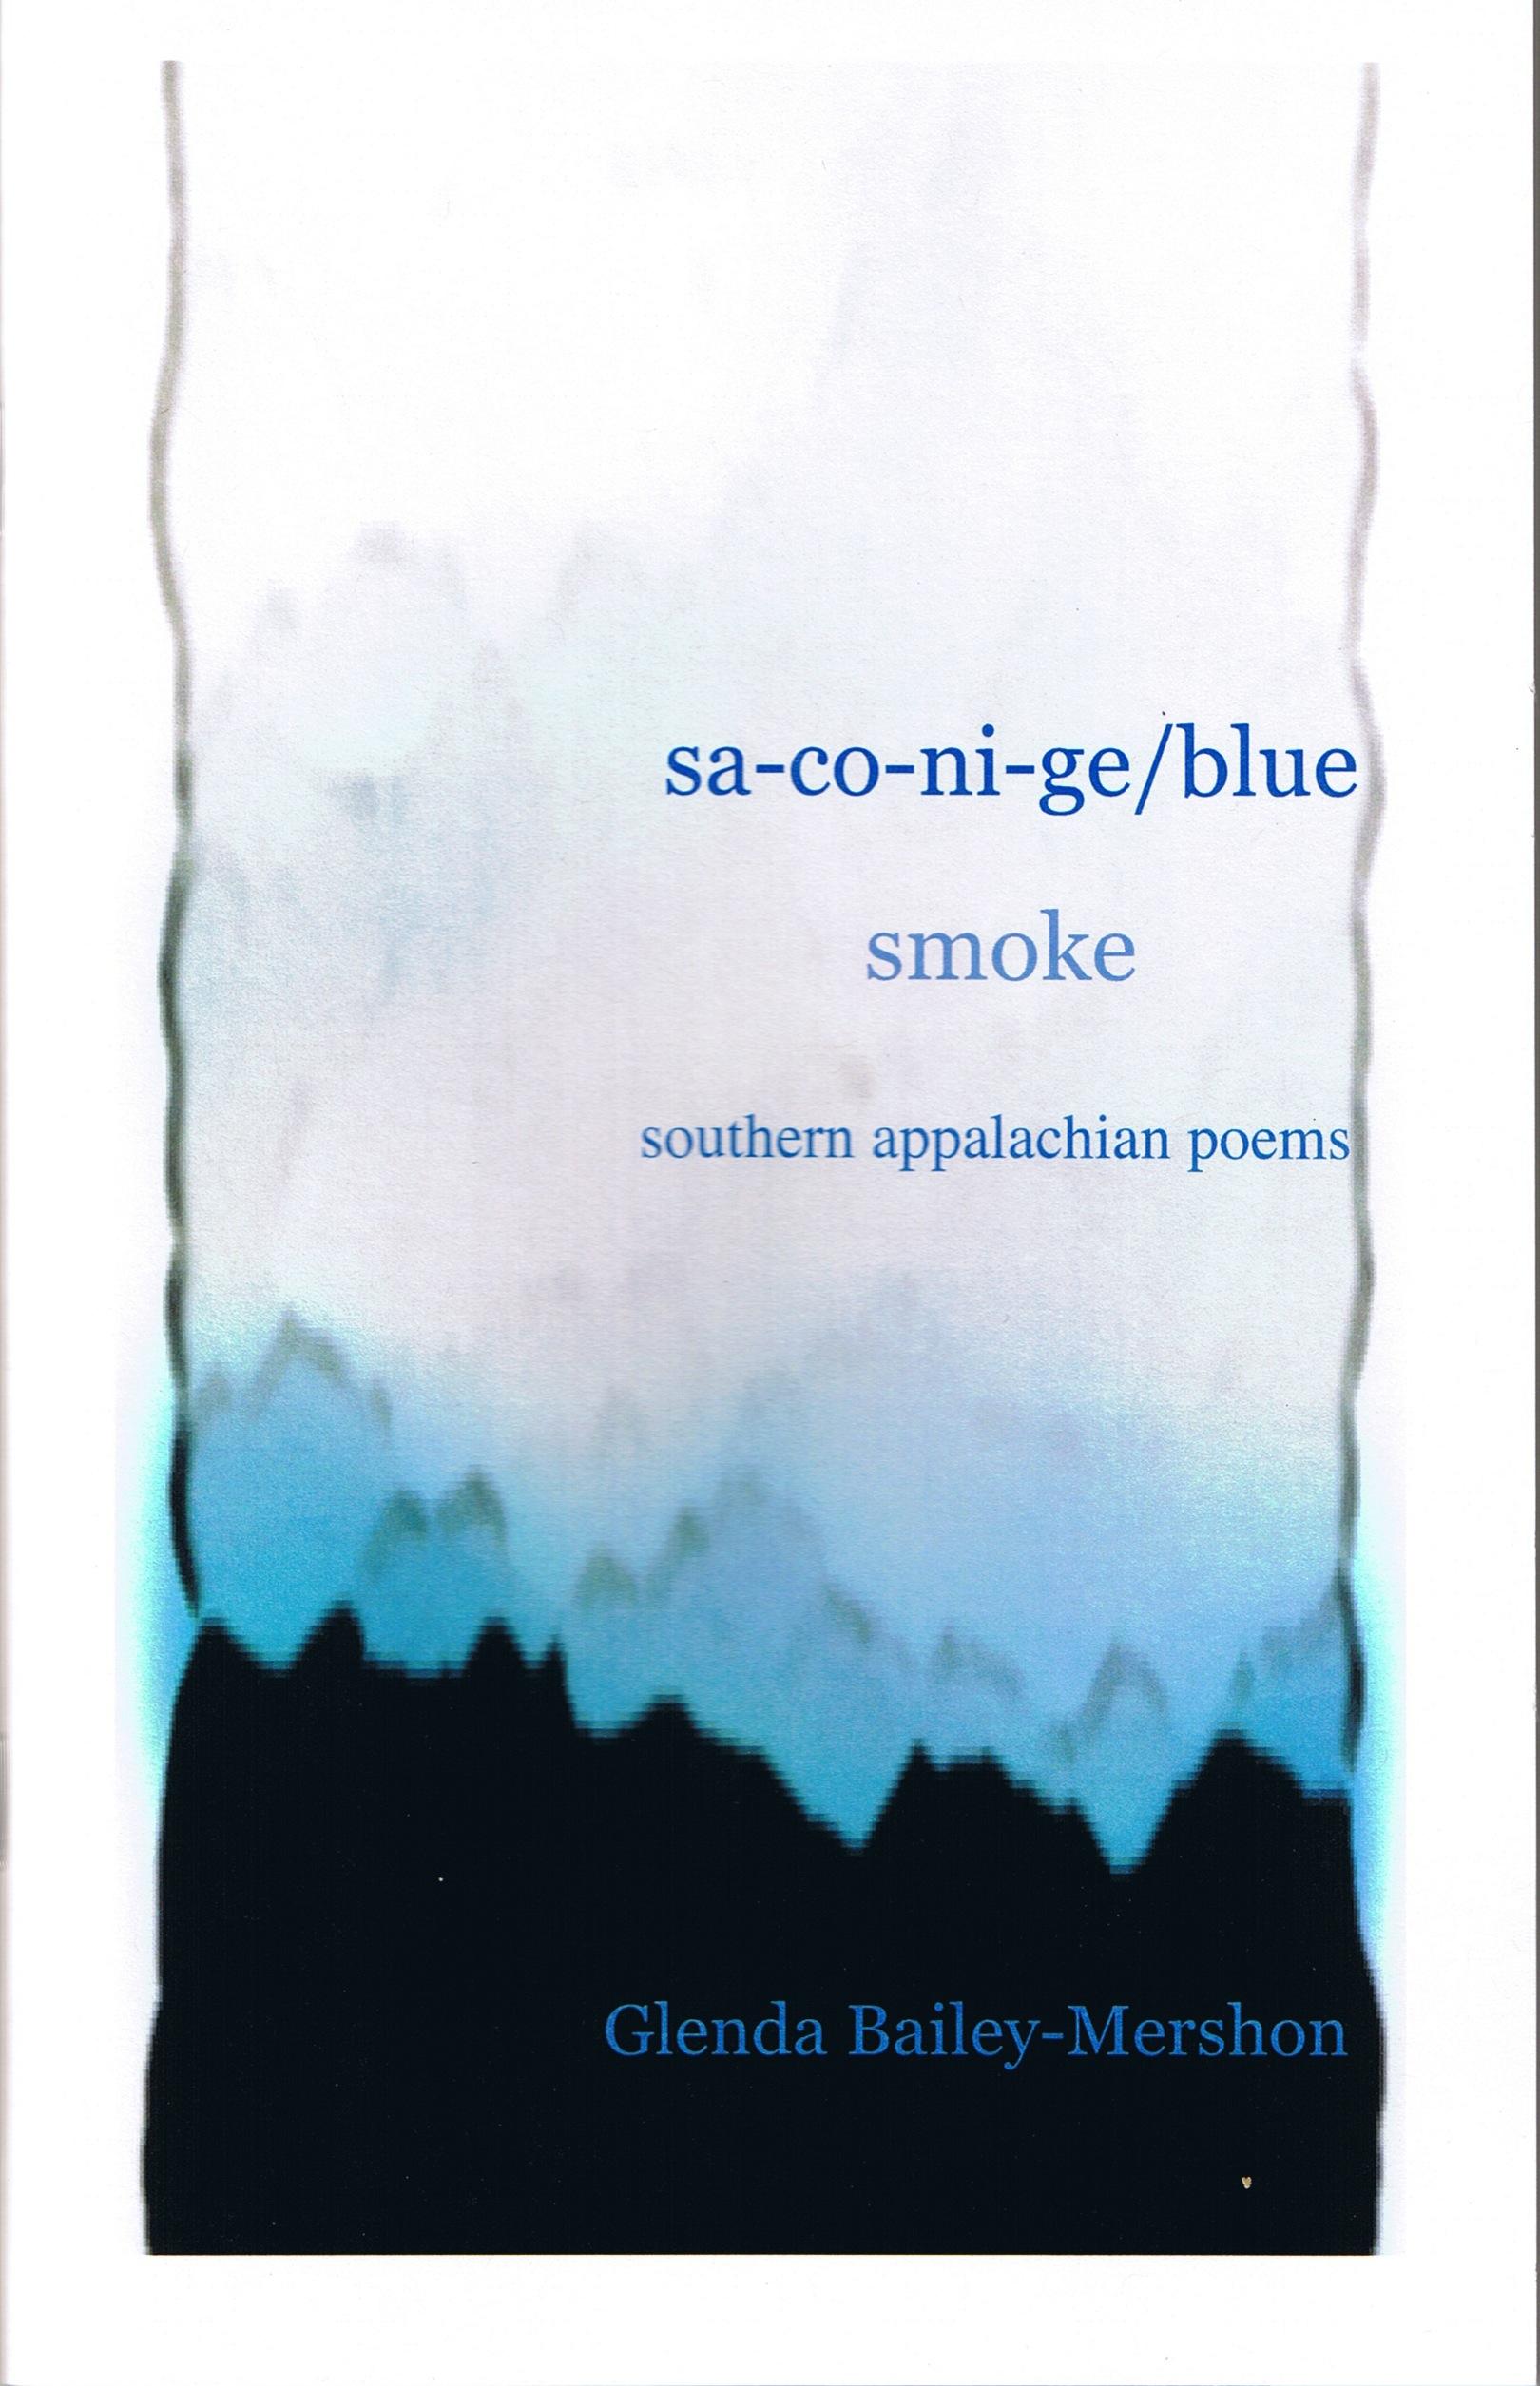 sa-co-ni-ge/blue smoke: poems from the Southern Appalachians